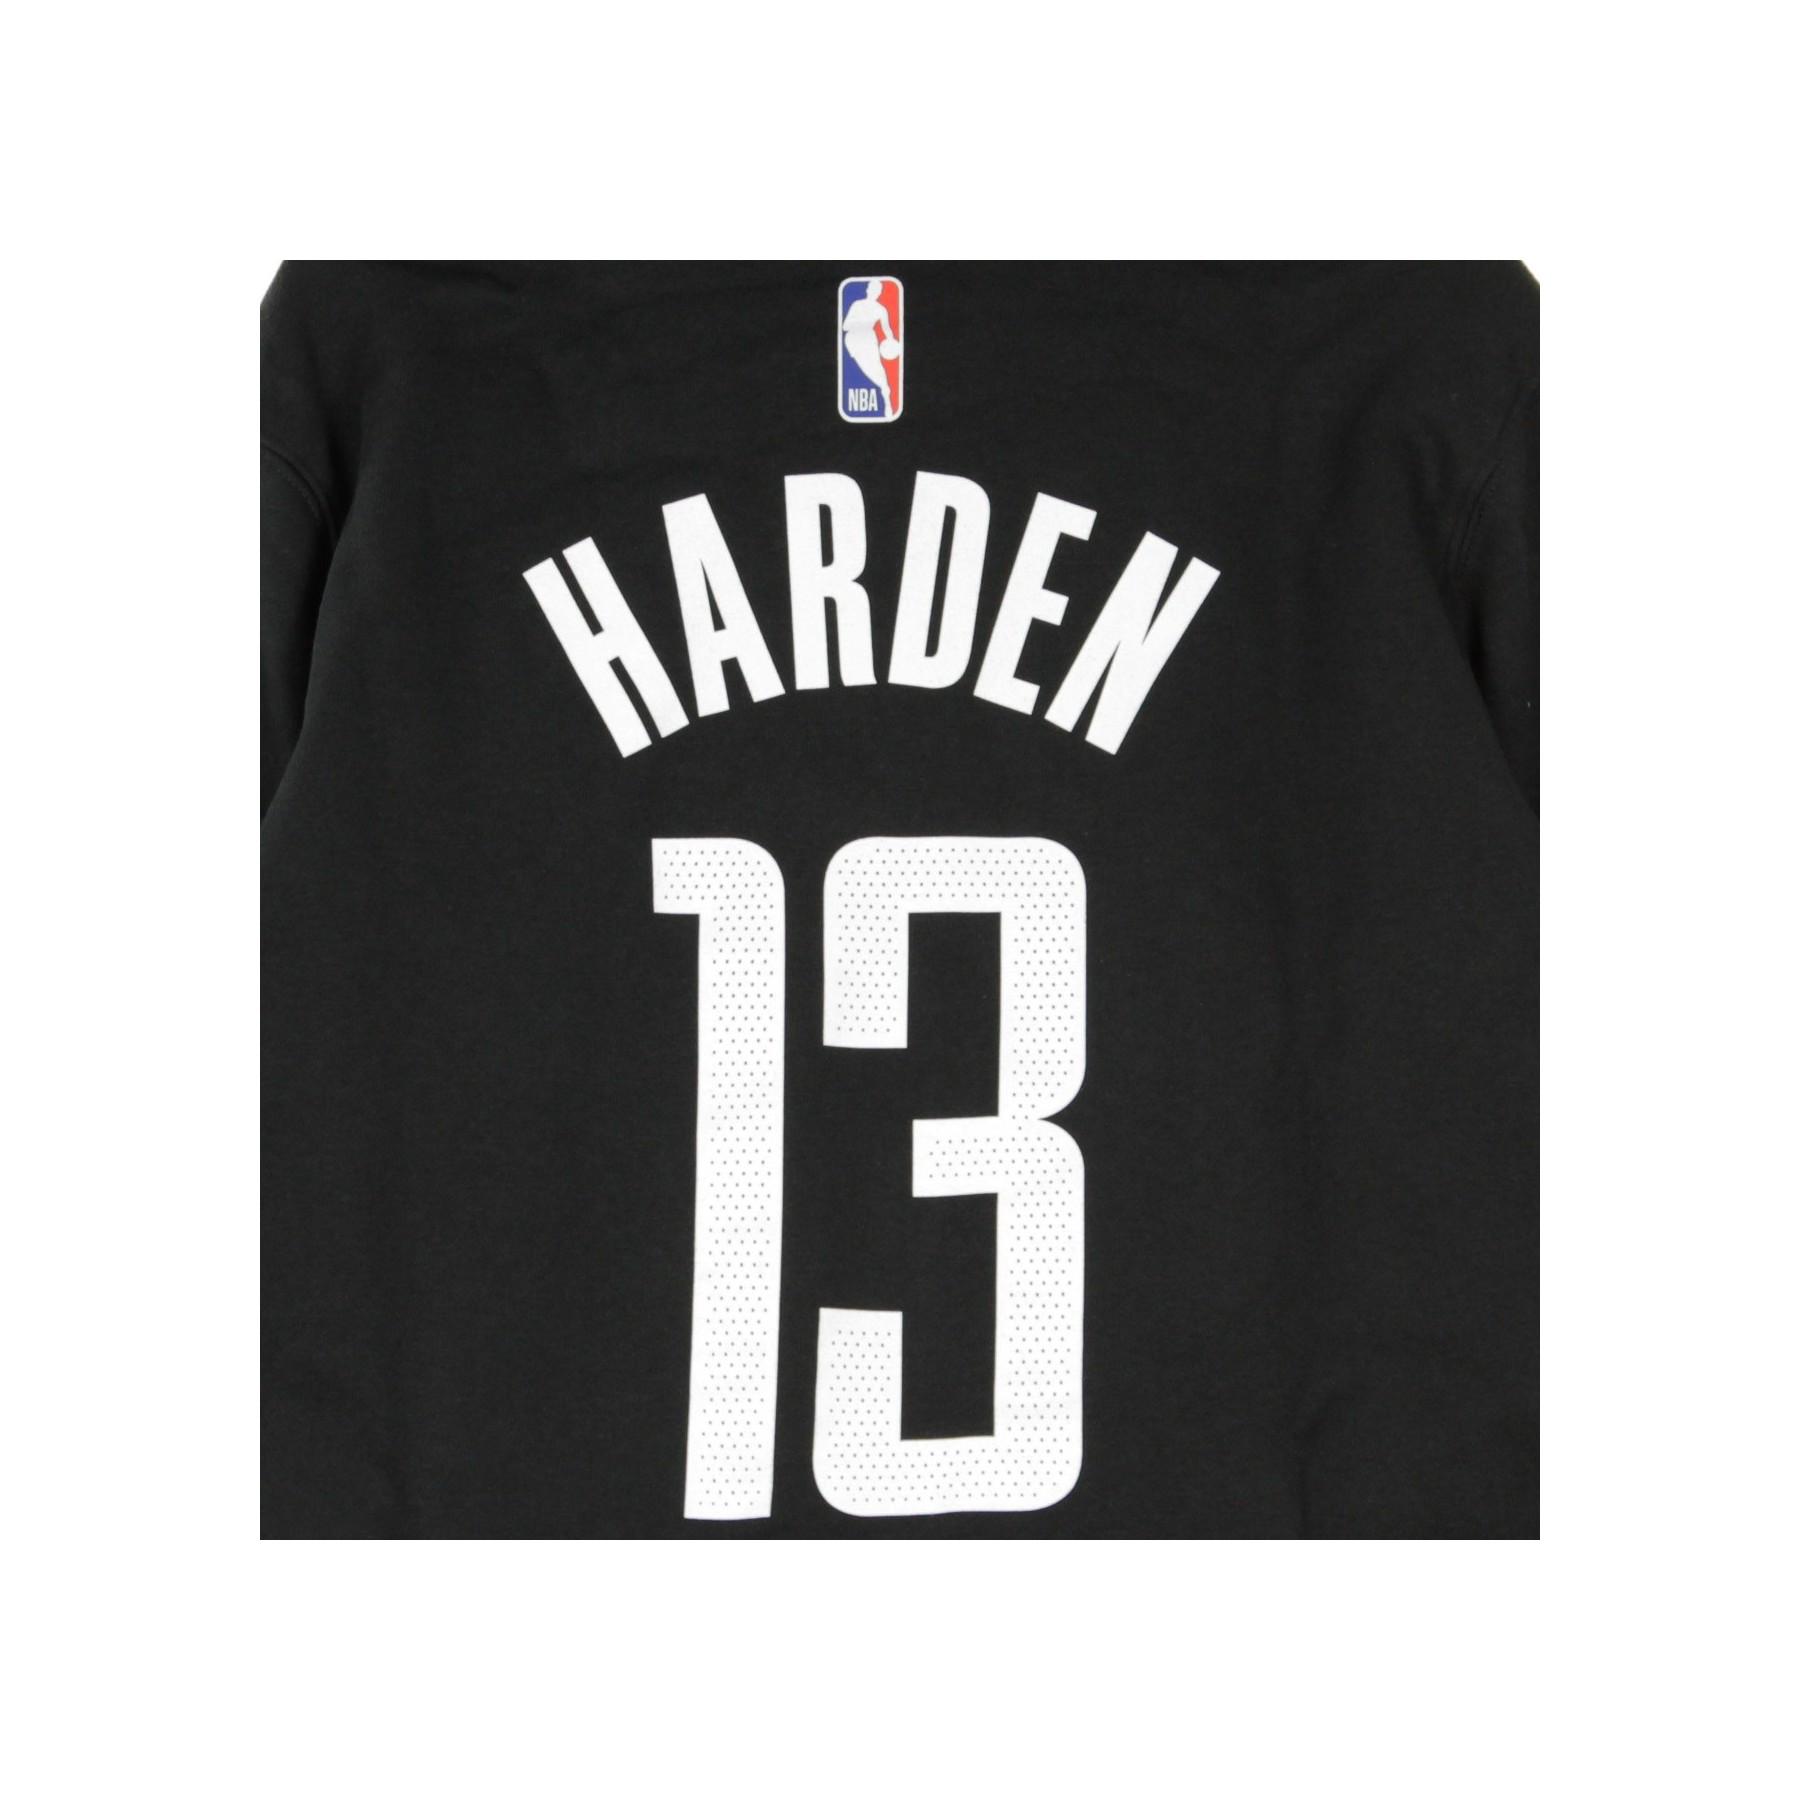 FELPA CAPPUCCIO NBA PO CLUB FLEECE LOGO NO13 JAMES HARDEN HOUROC L